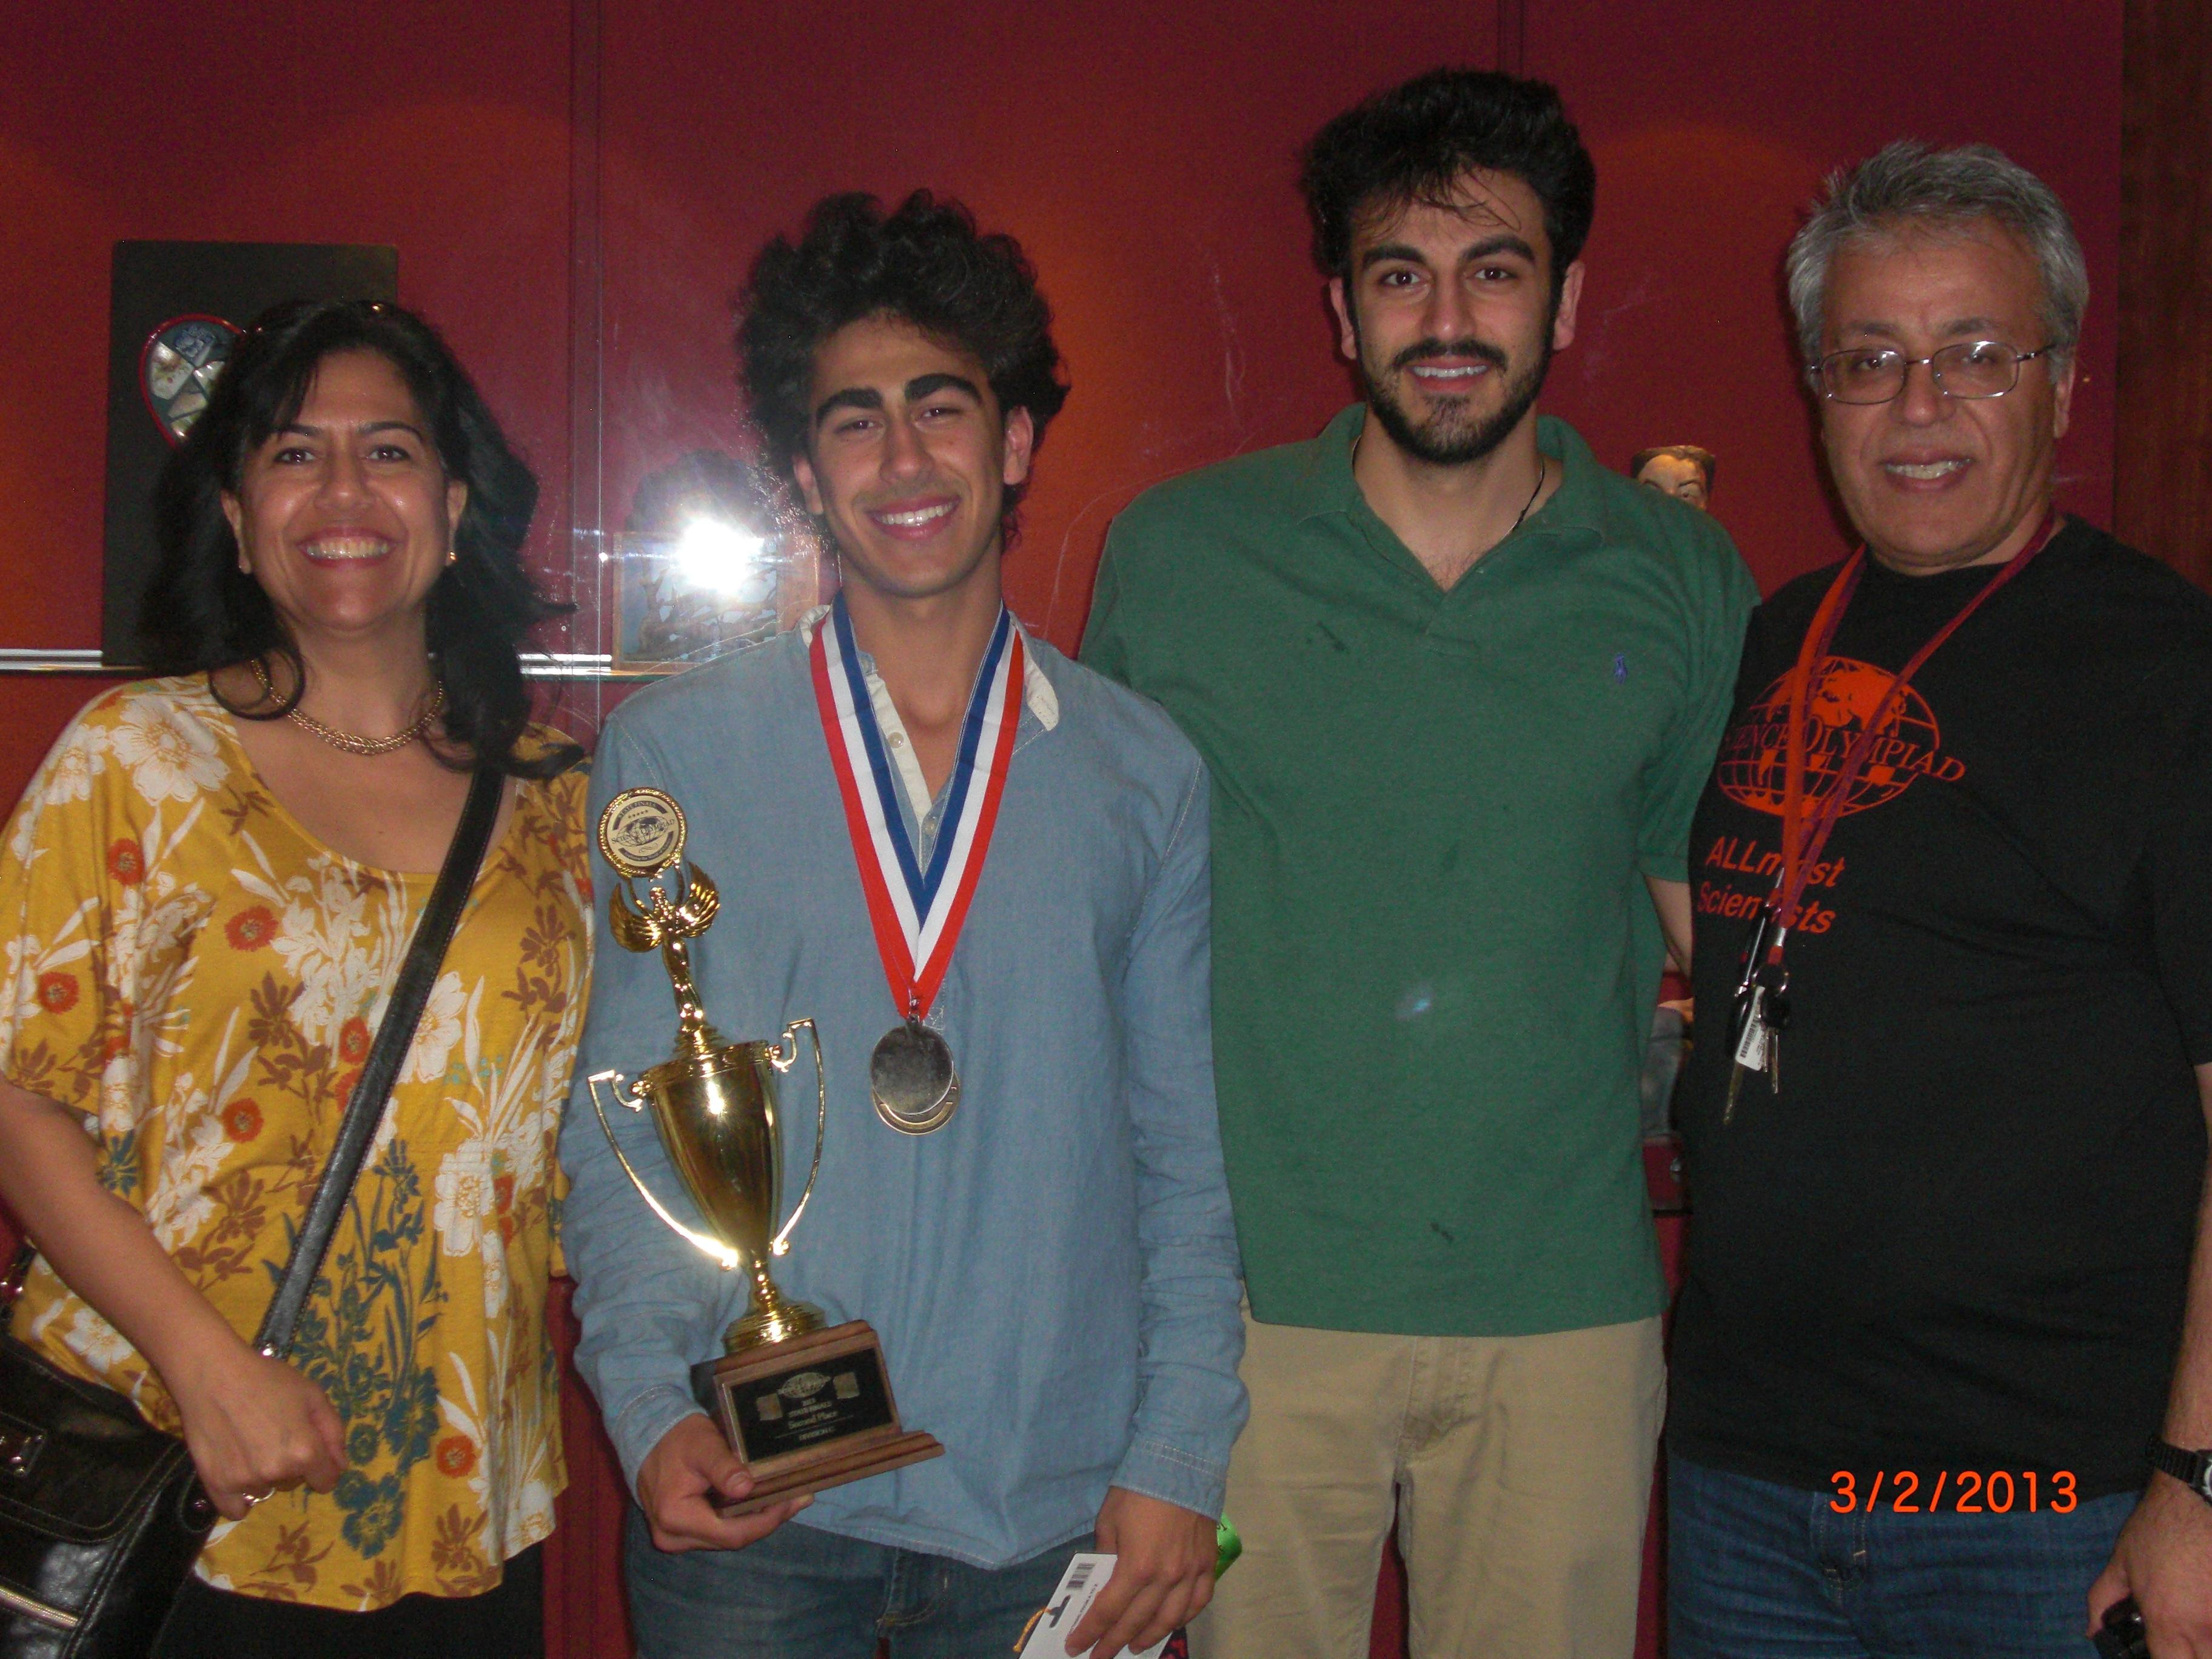 Anne, Matine (Metin), Yahya ve Edip - 3 Mart 2013, Phoenix, Science Olympiad